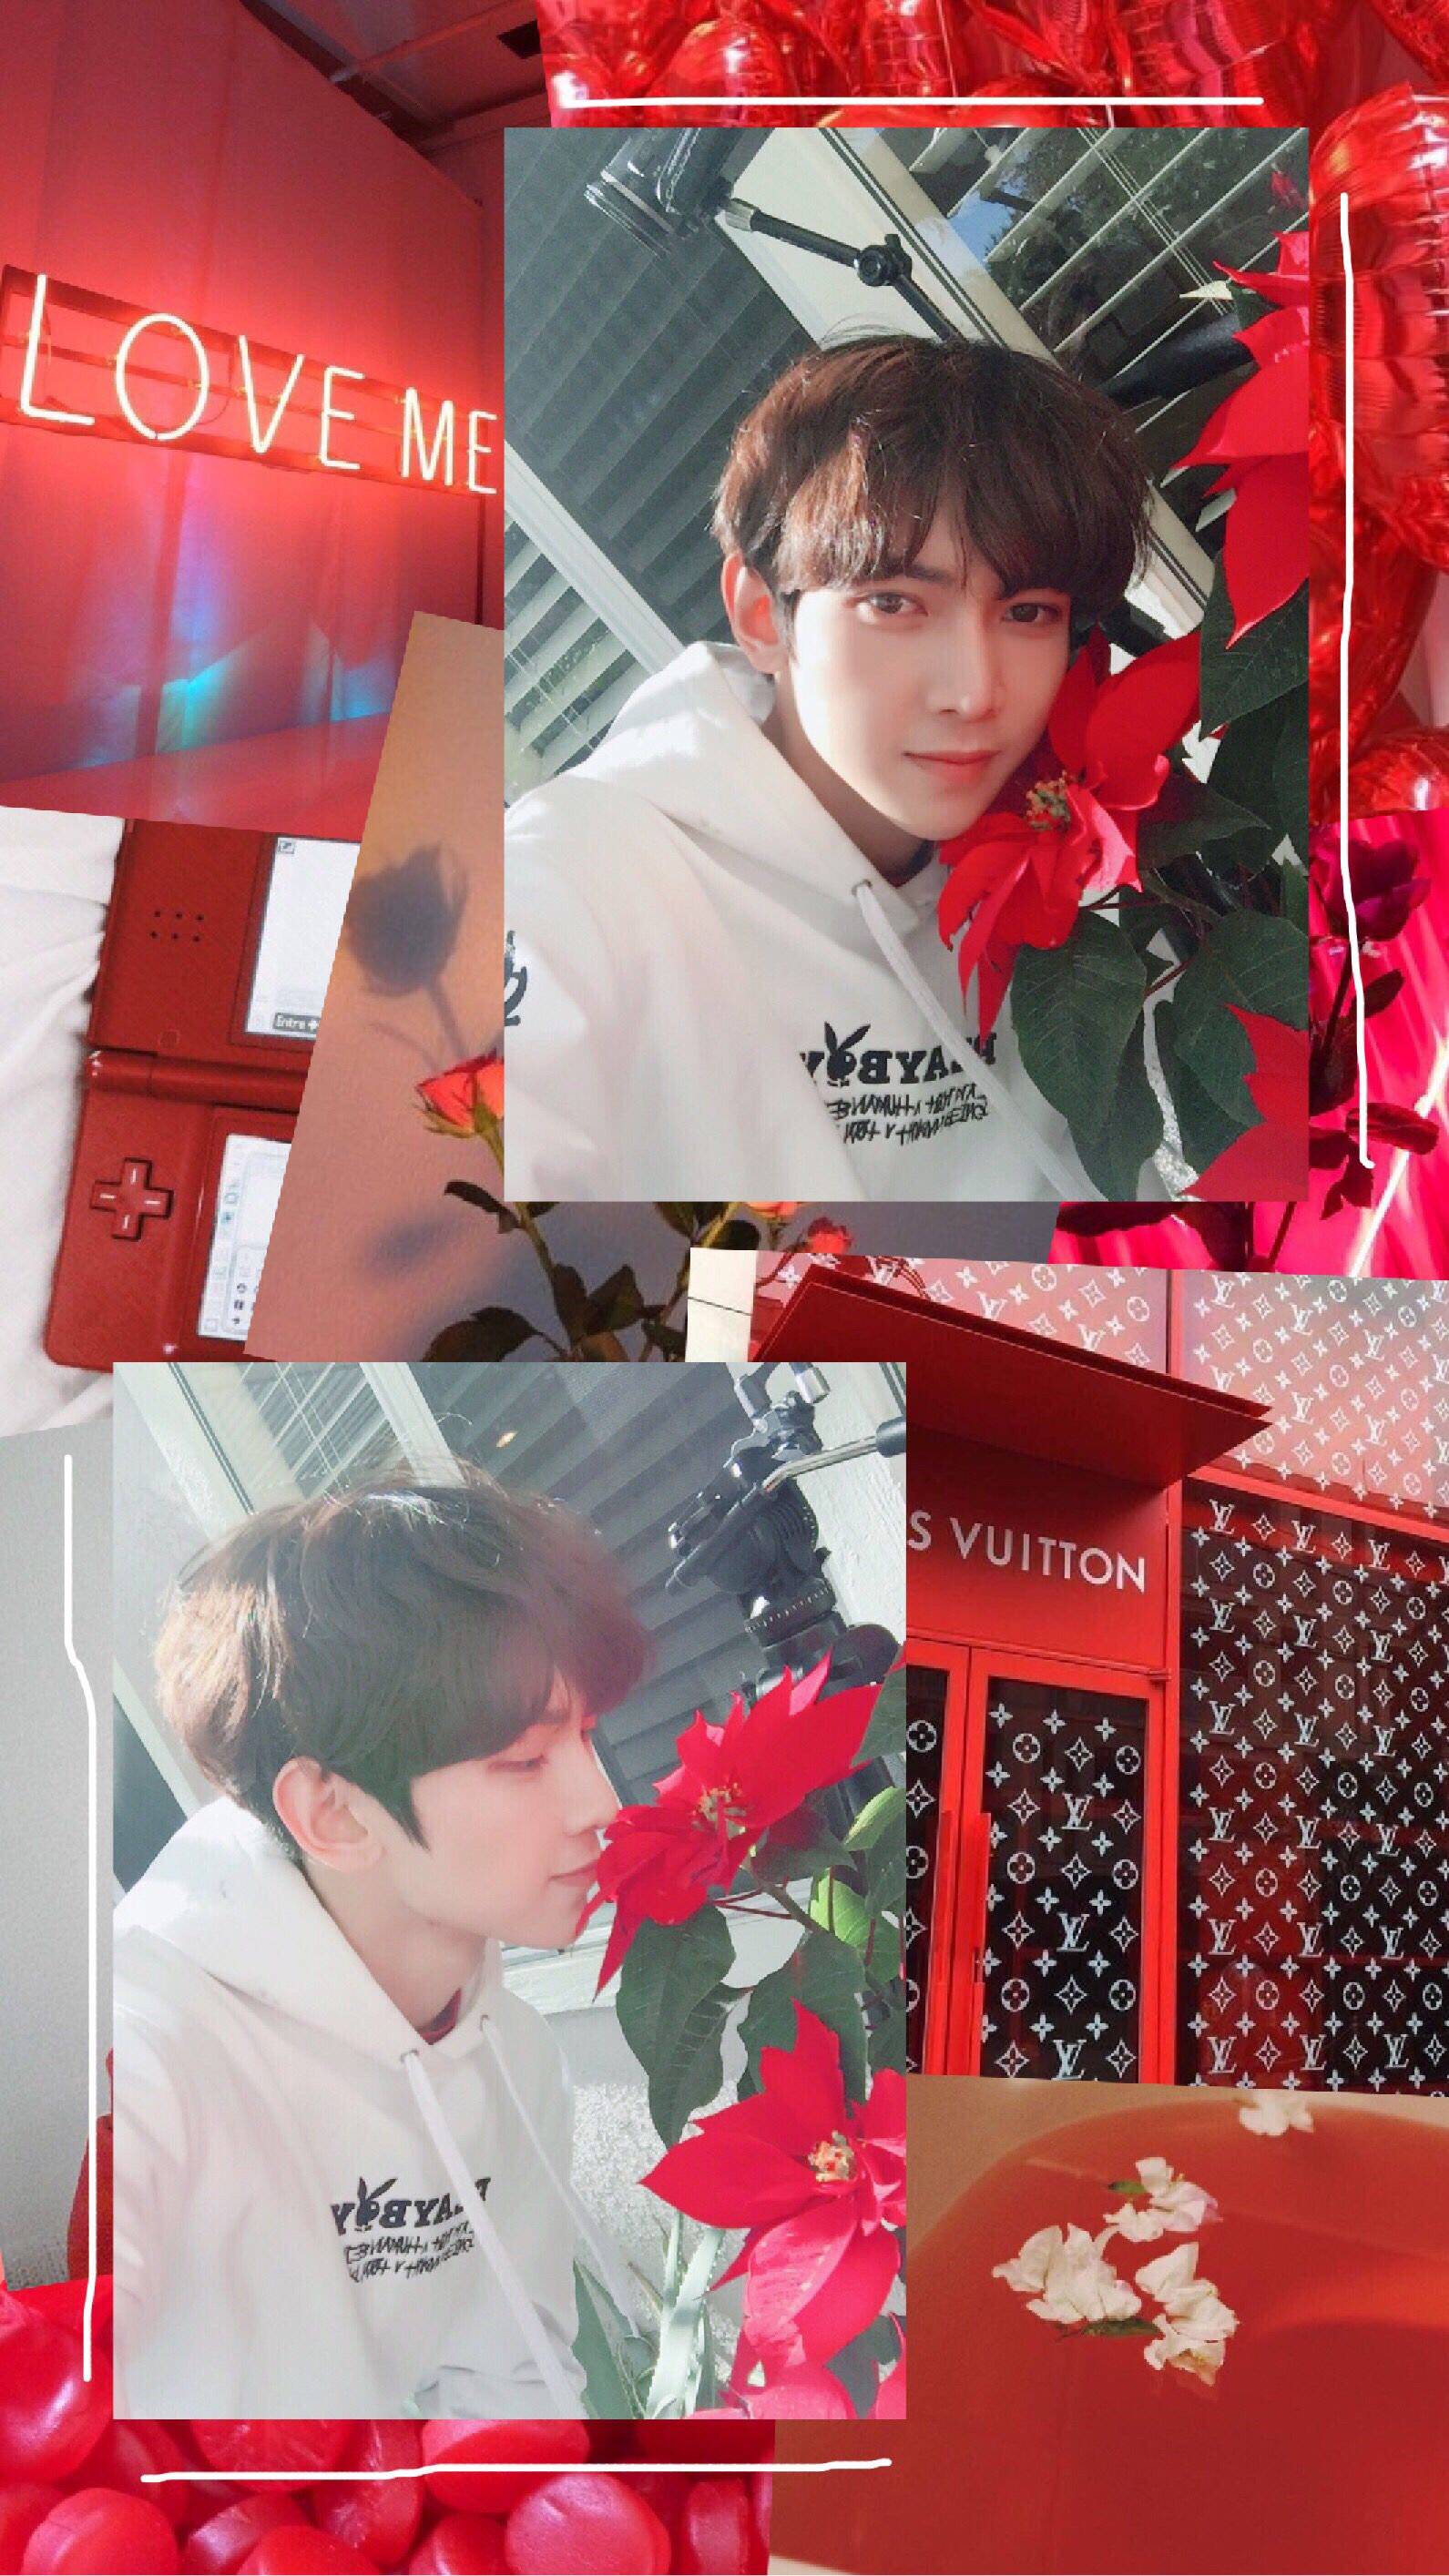 Ateez Atiny Yeosang Kangyeosang Kpop Edit Wallpaper In